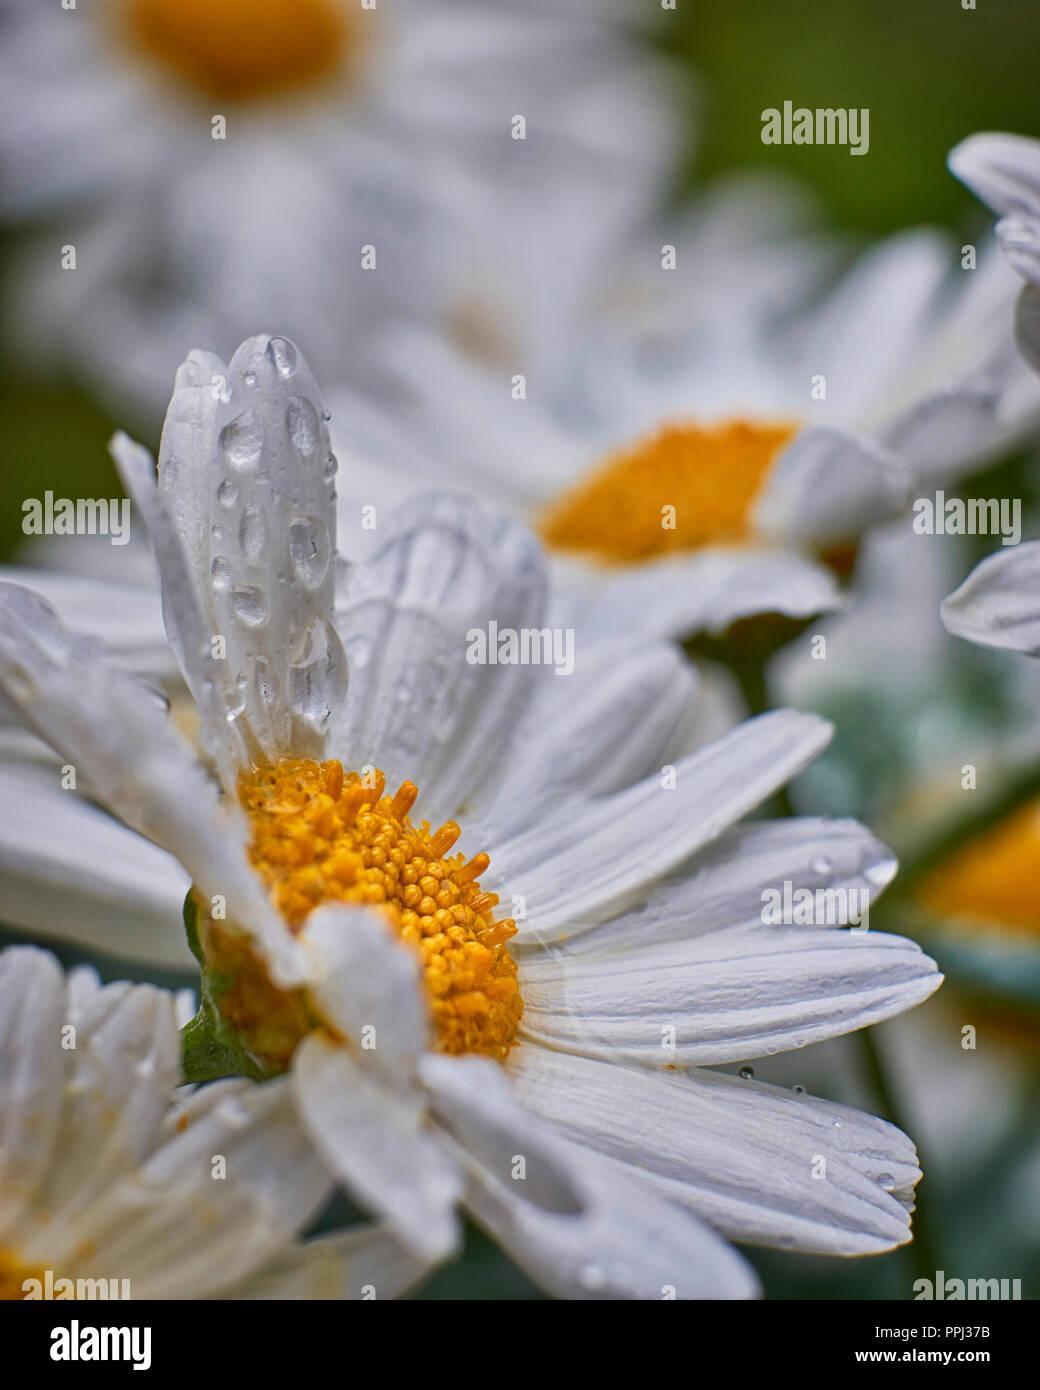 Beautiful White Daisies Flowers With Raindrops Stock Photo